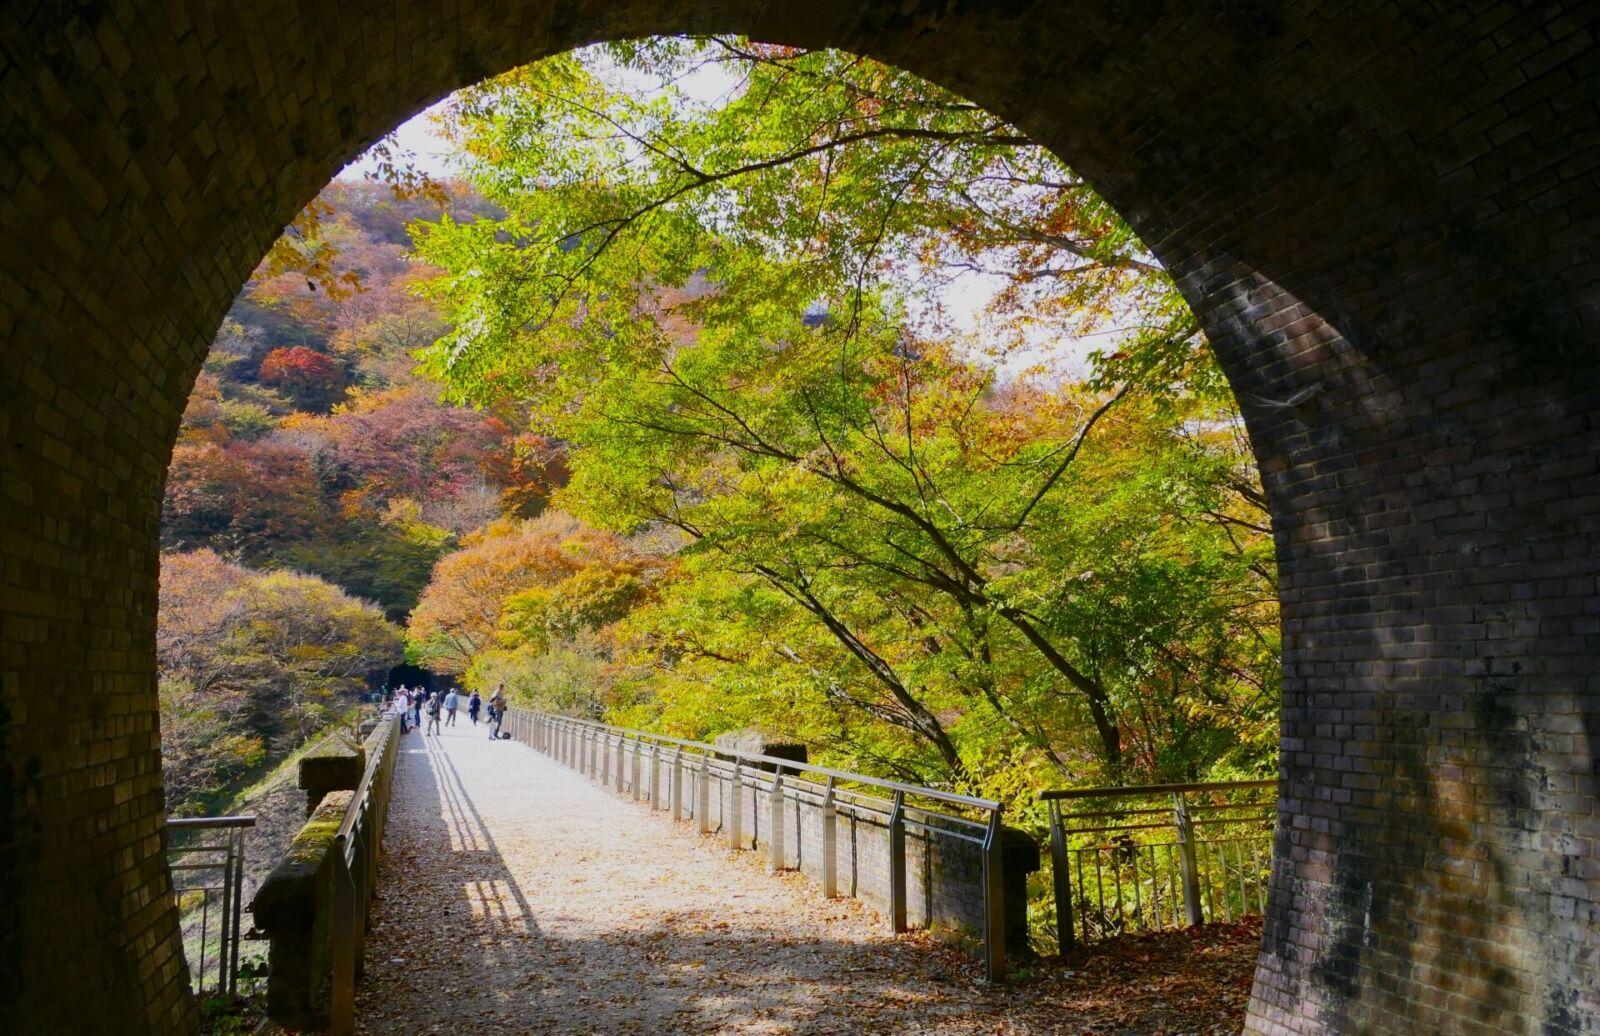 karuizawa-usui-toge-trail